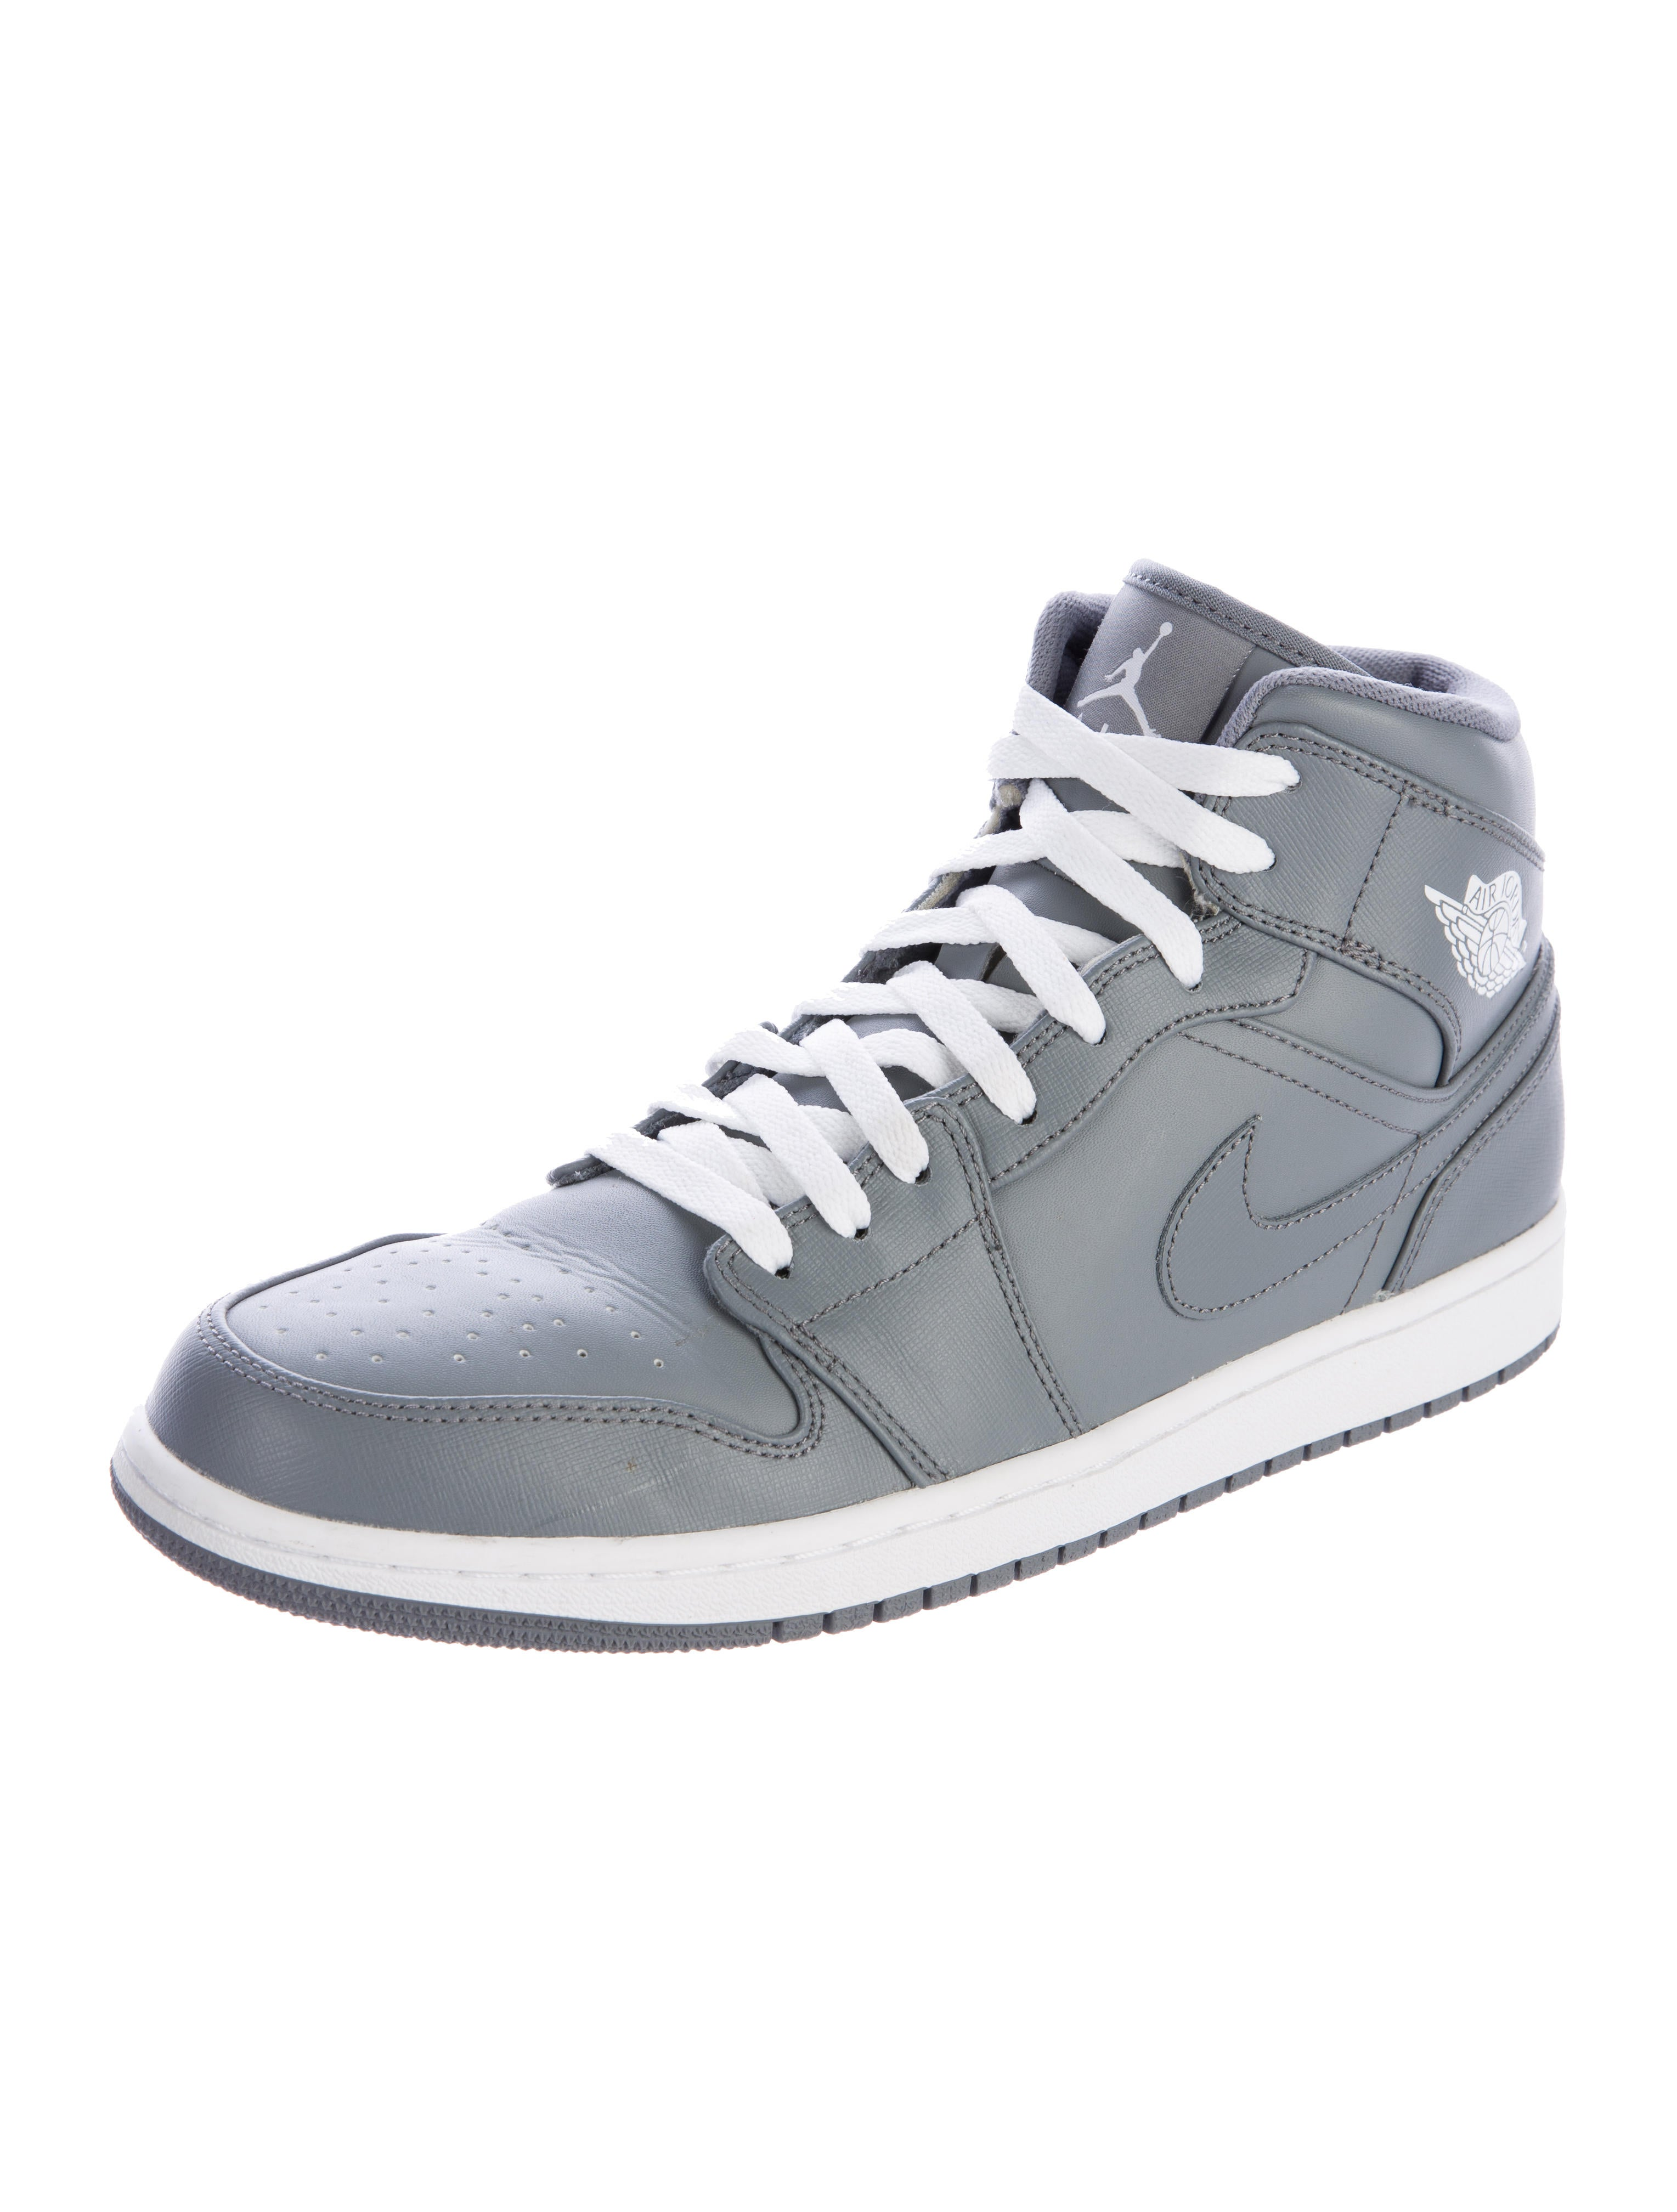 nike air jordan 1 mid sneakers shoes wniaj20144 the. Black Bedroom Furniture Sets. Home Design Ideas